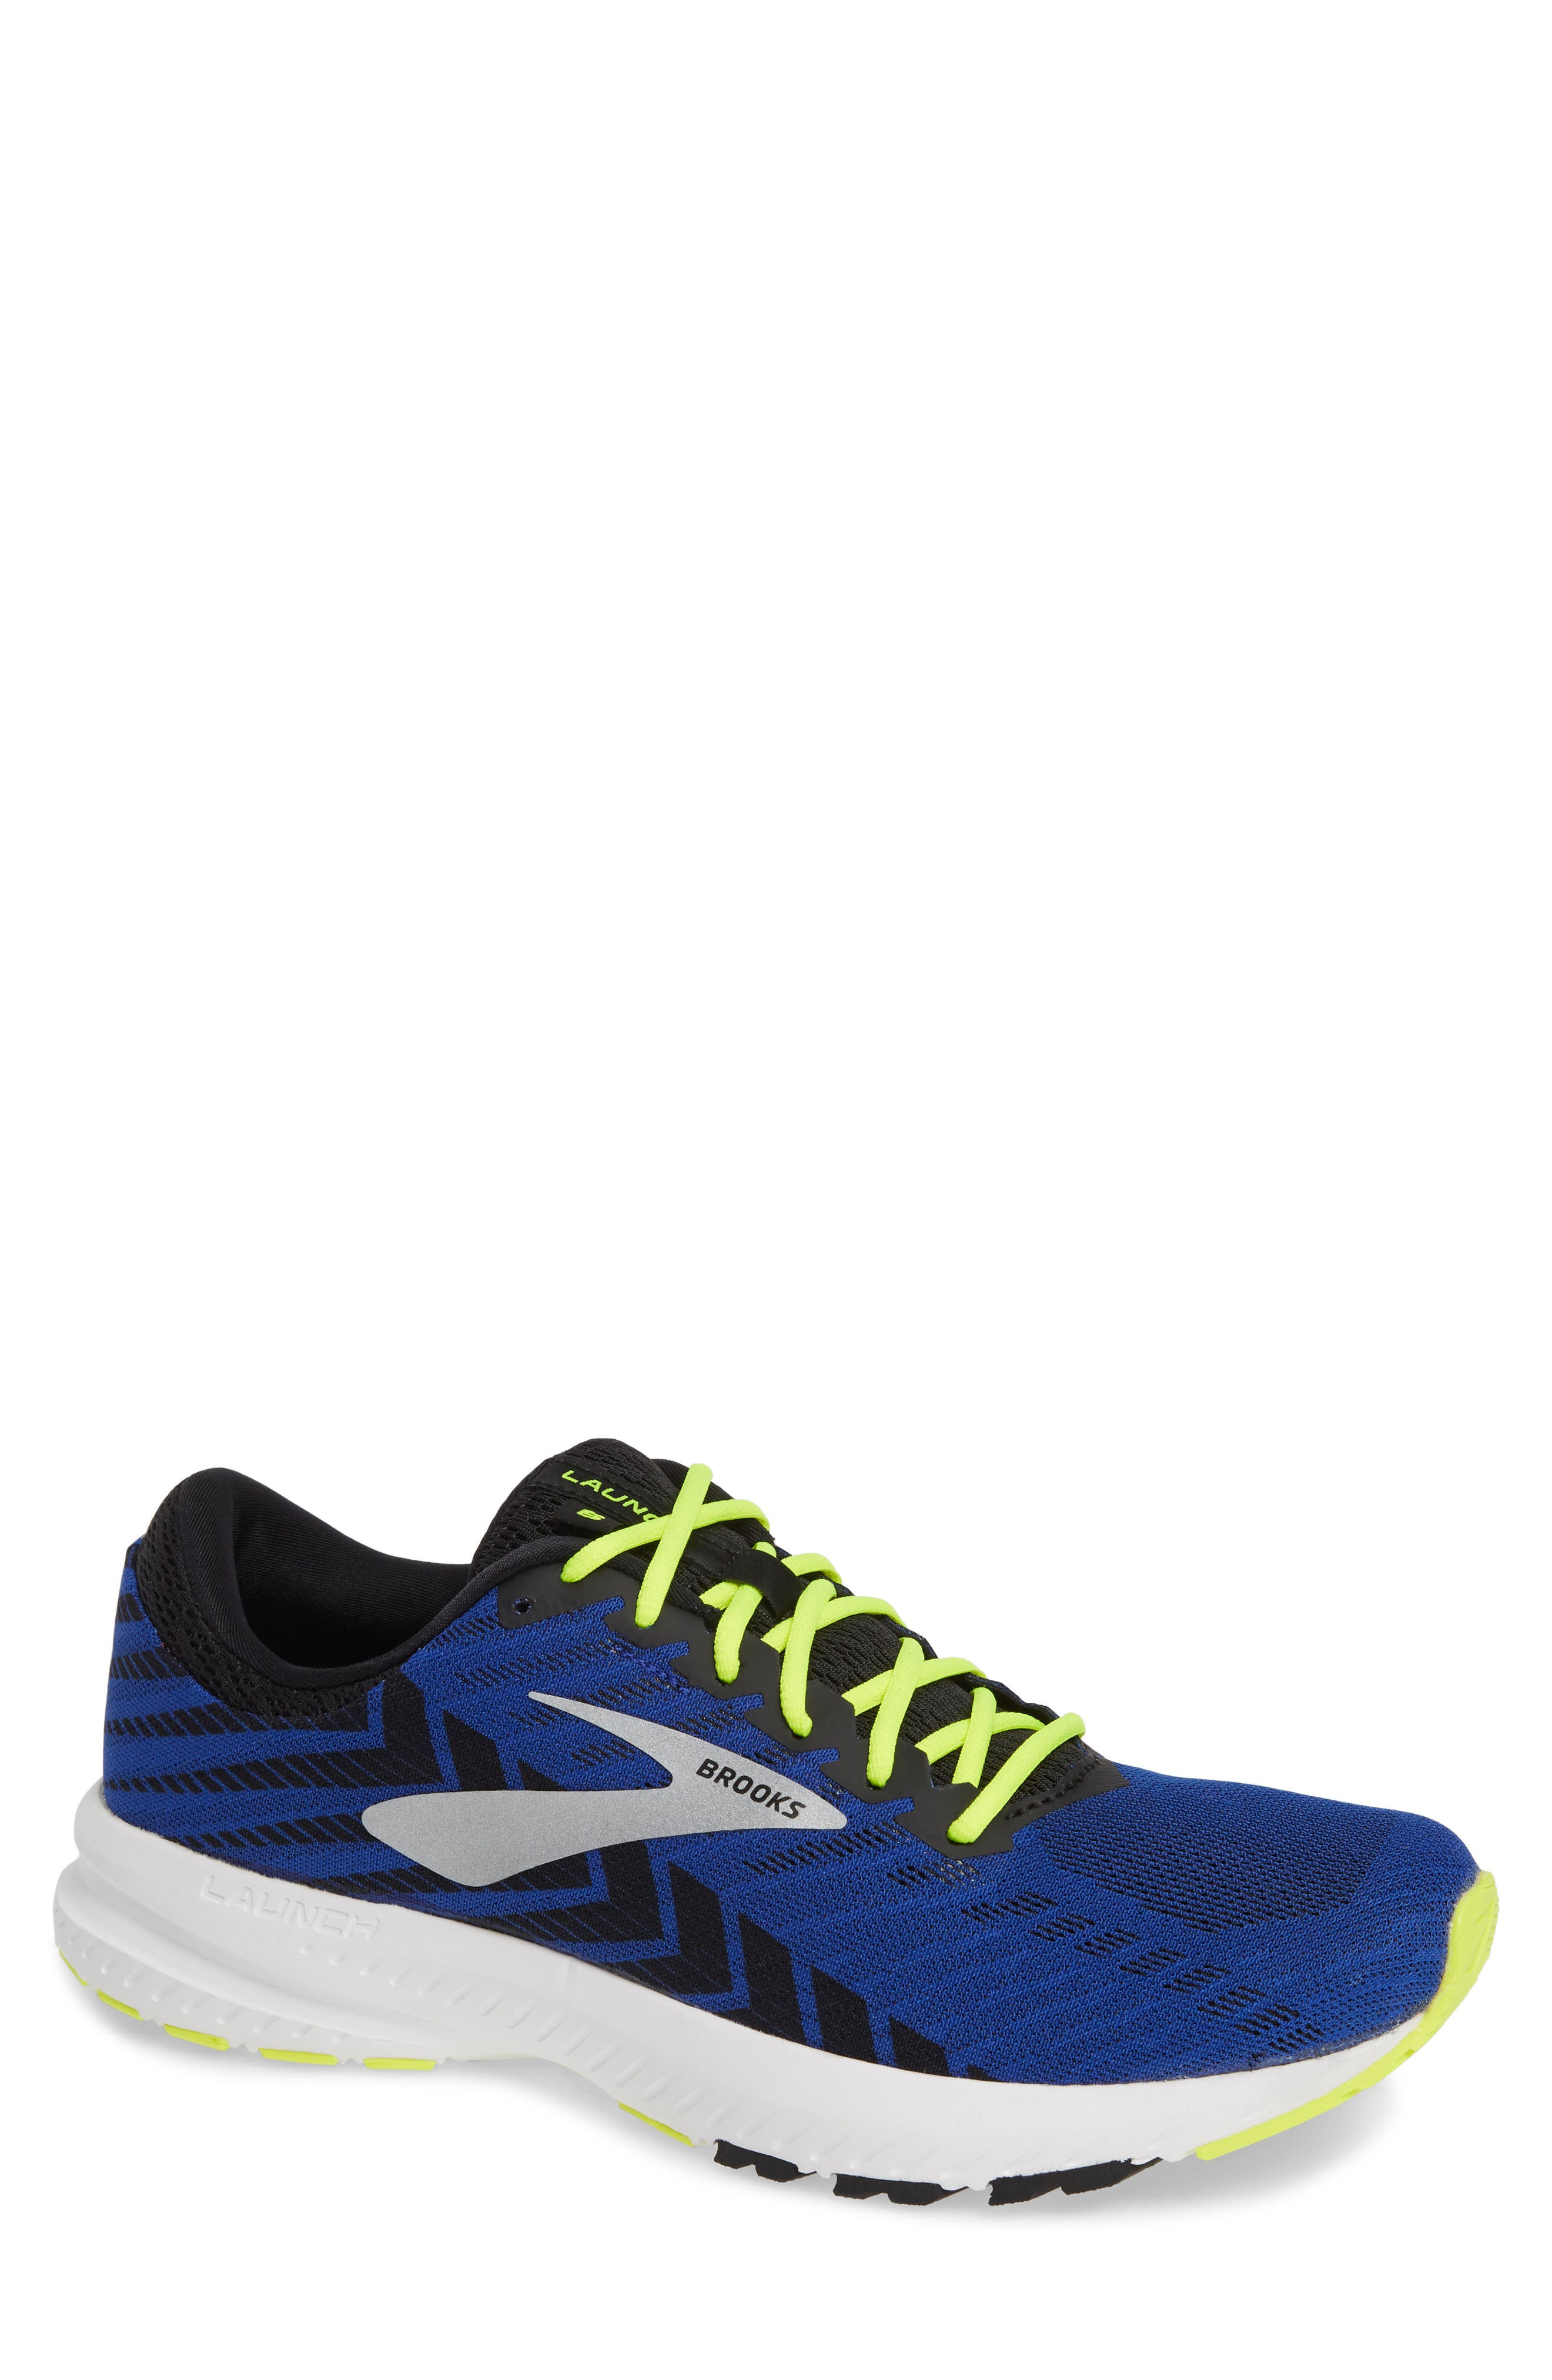 Brooks Launch 6 Running Shoe, Blue